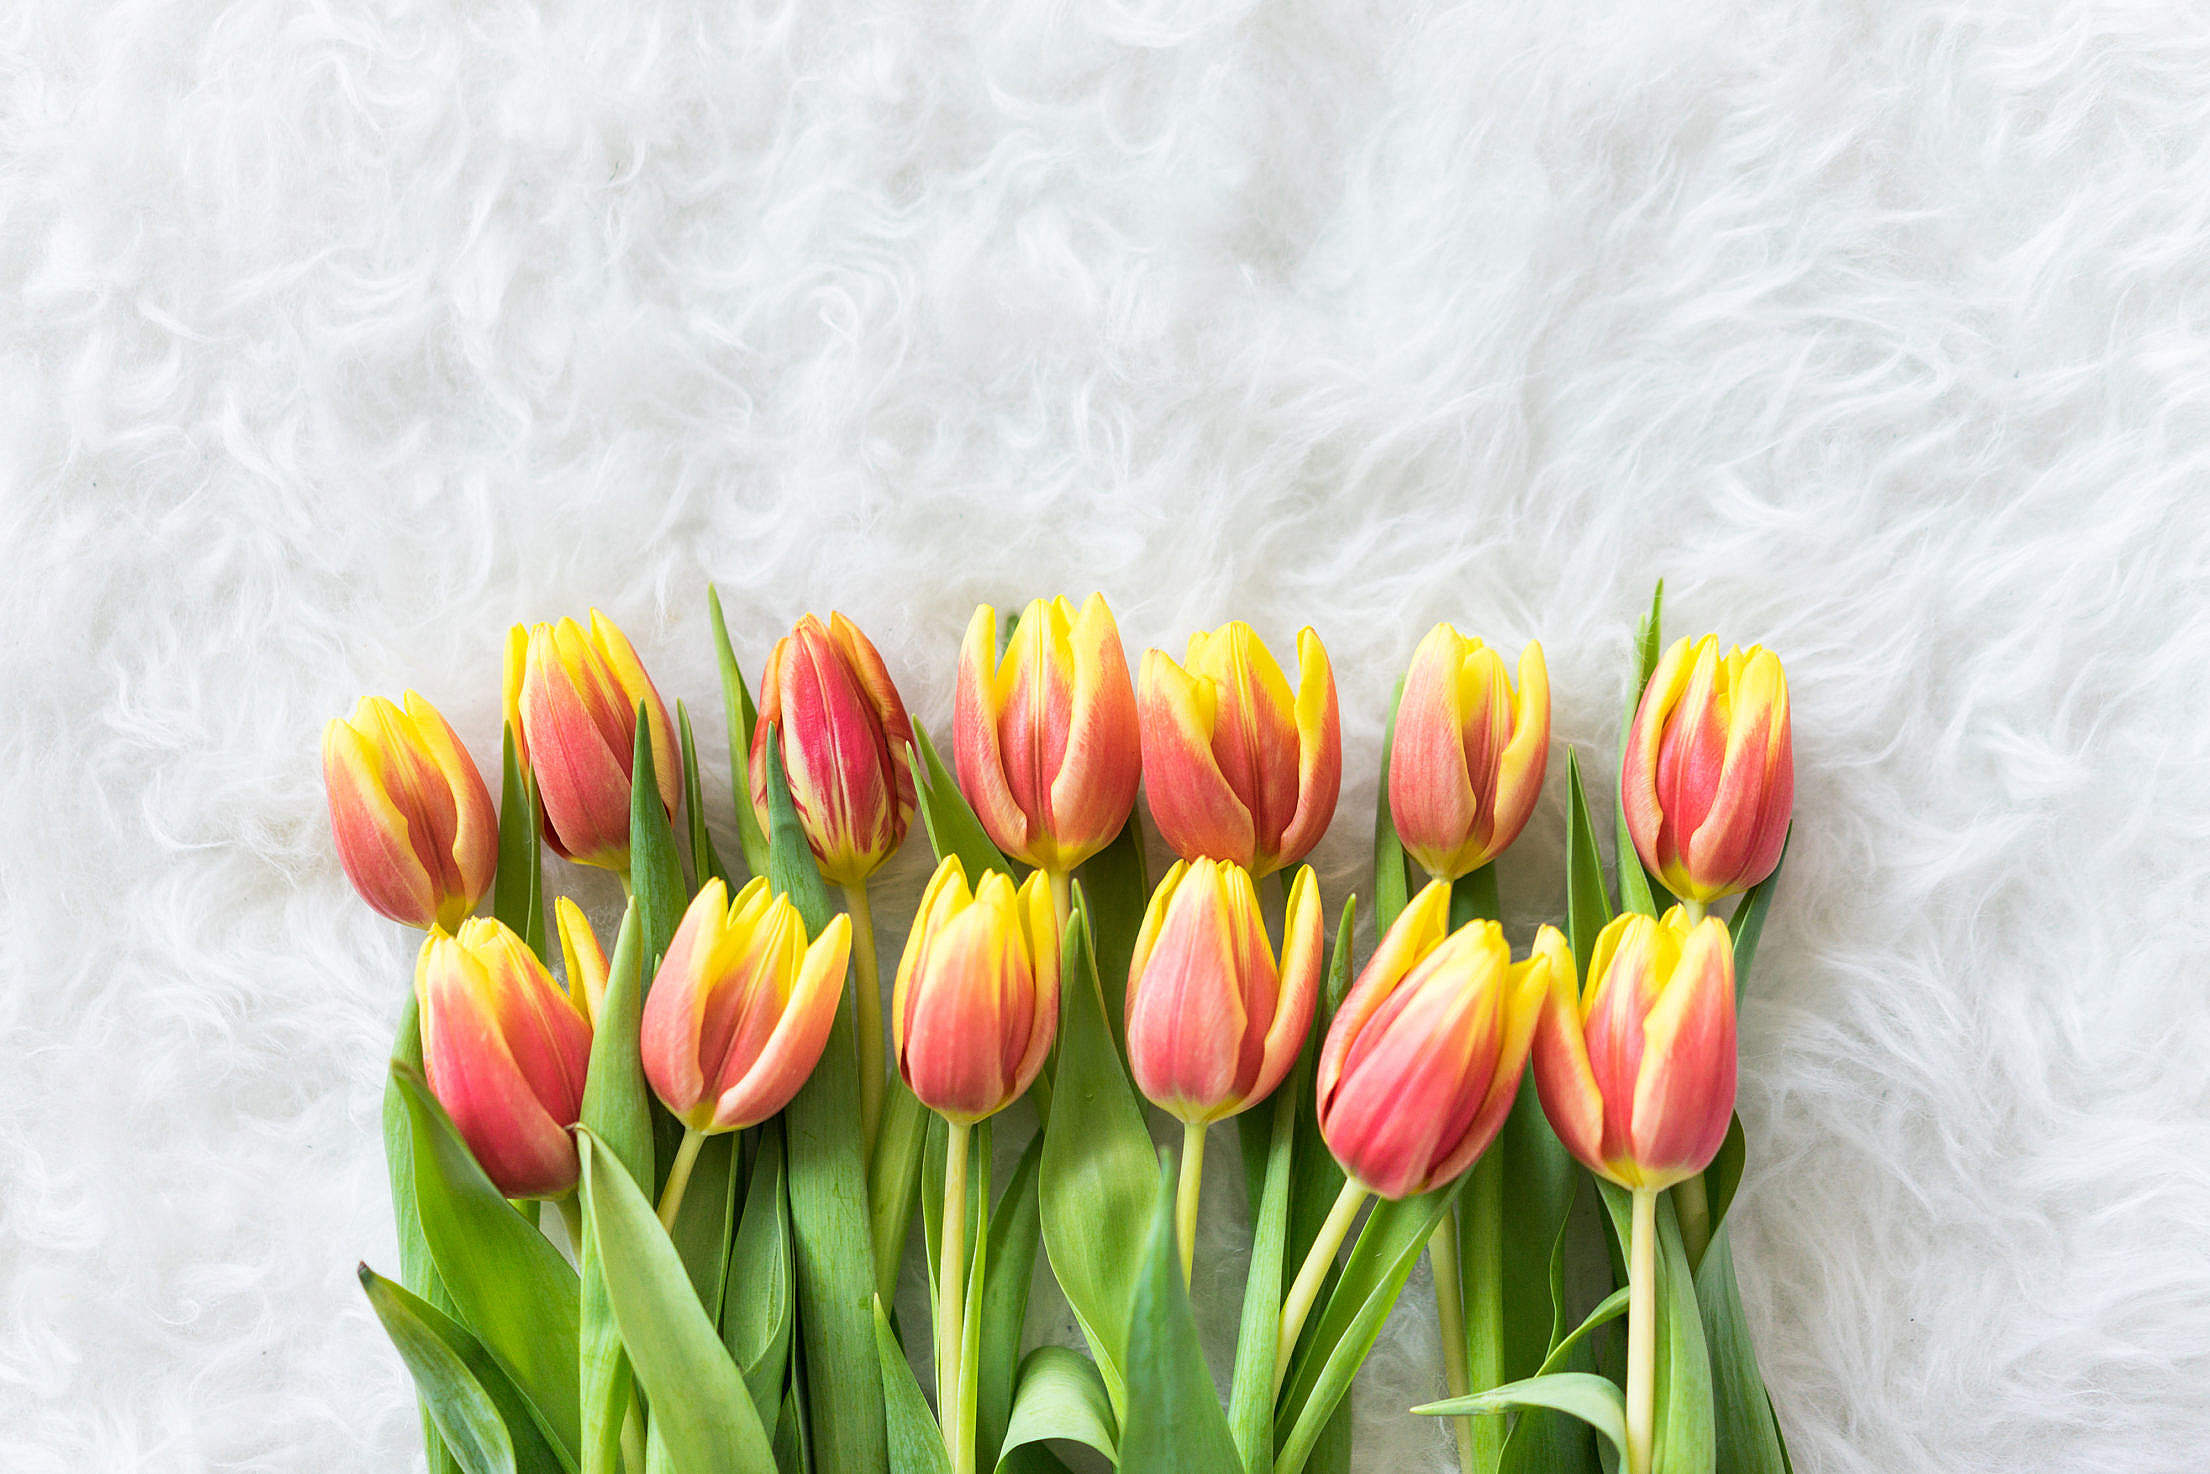 Red-Yellow Kees Nelis Tulips on White Pelt Free Stock Photo